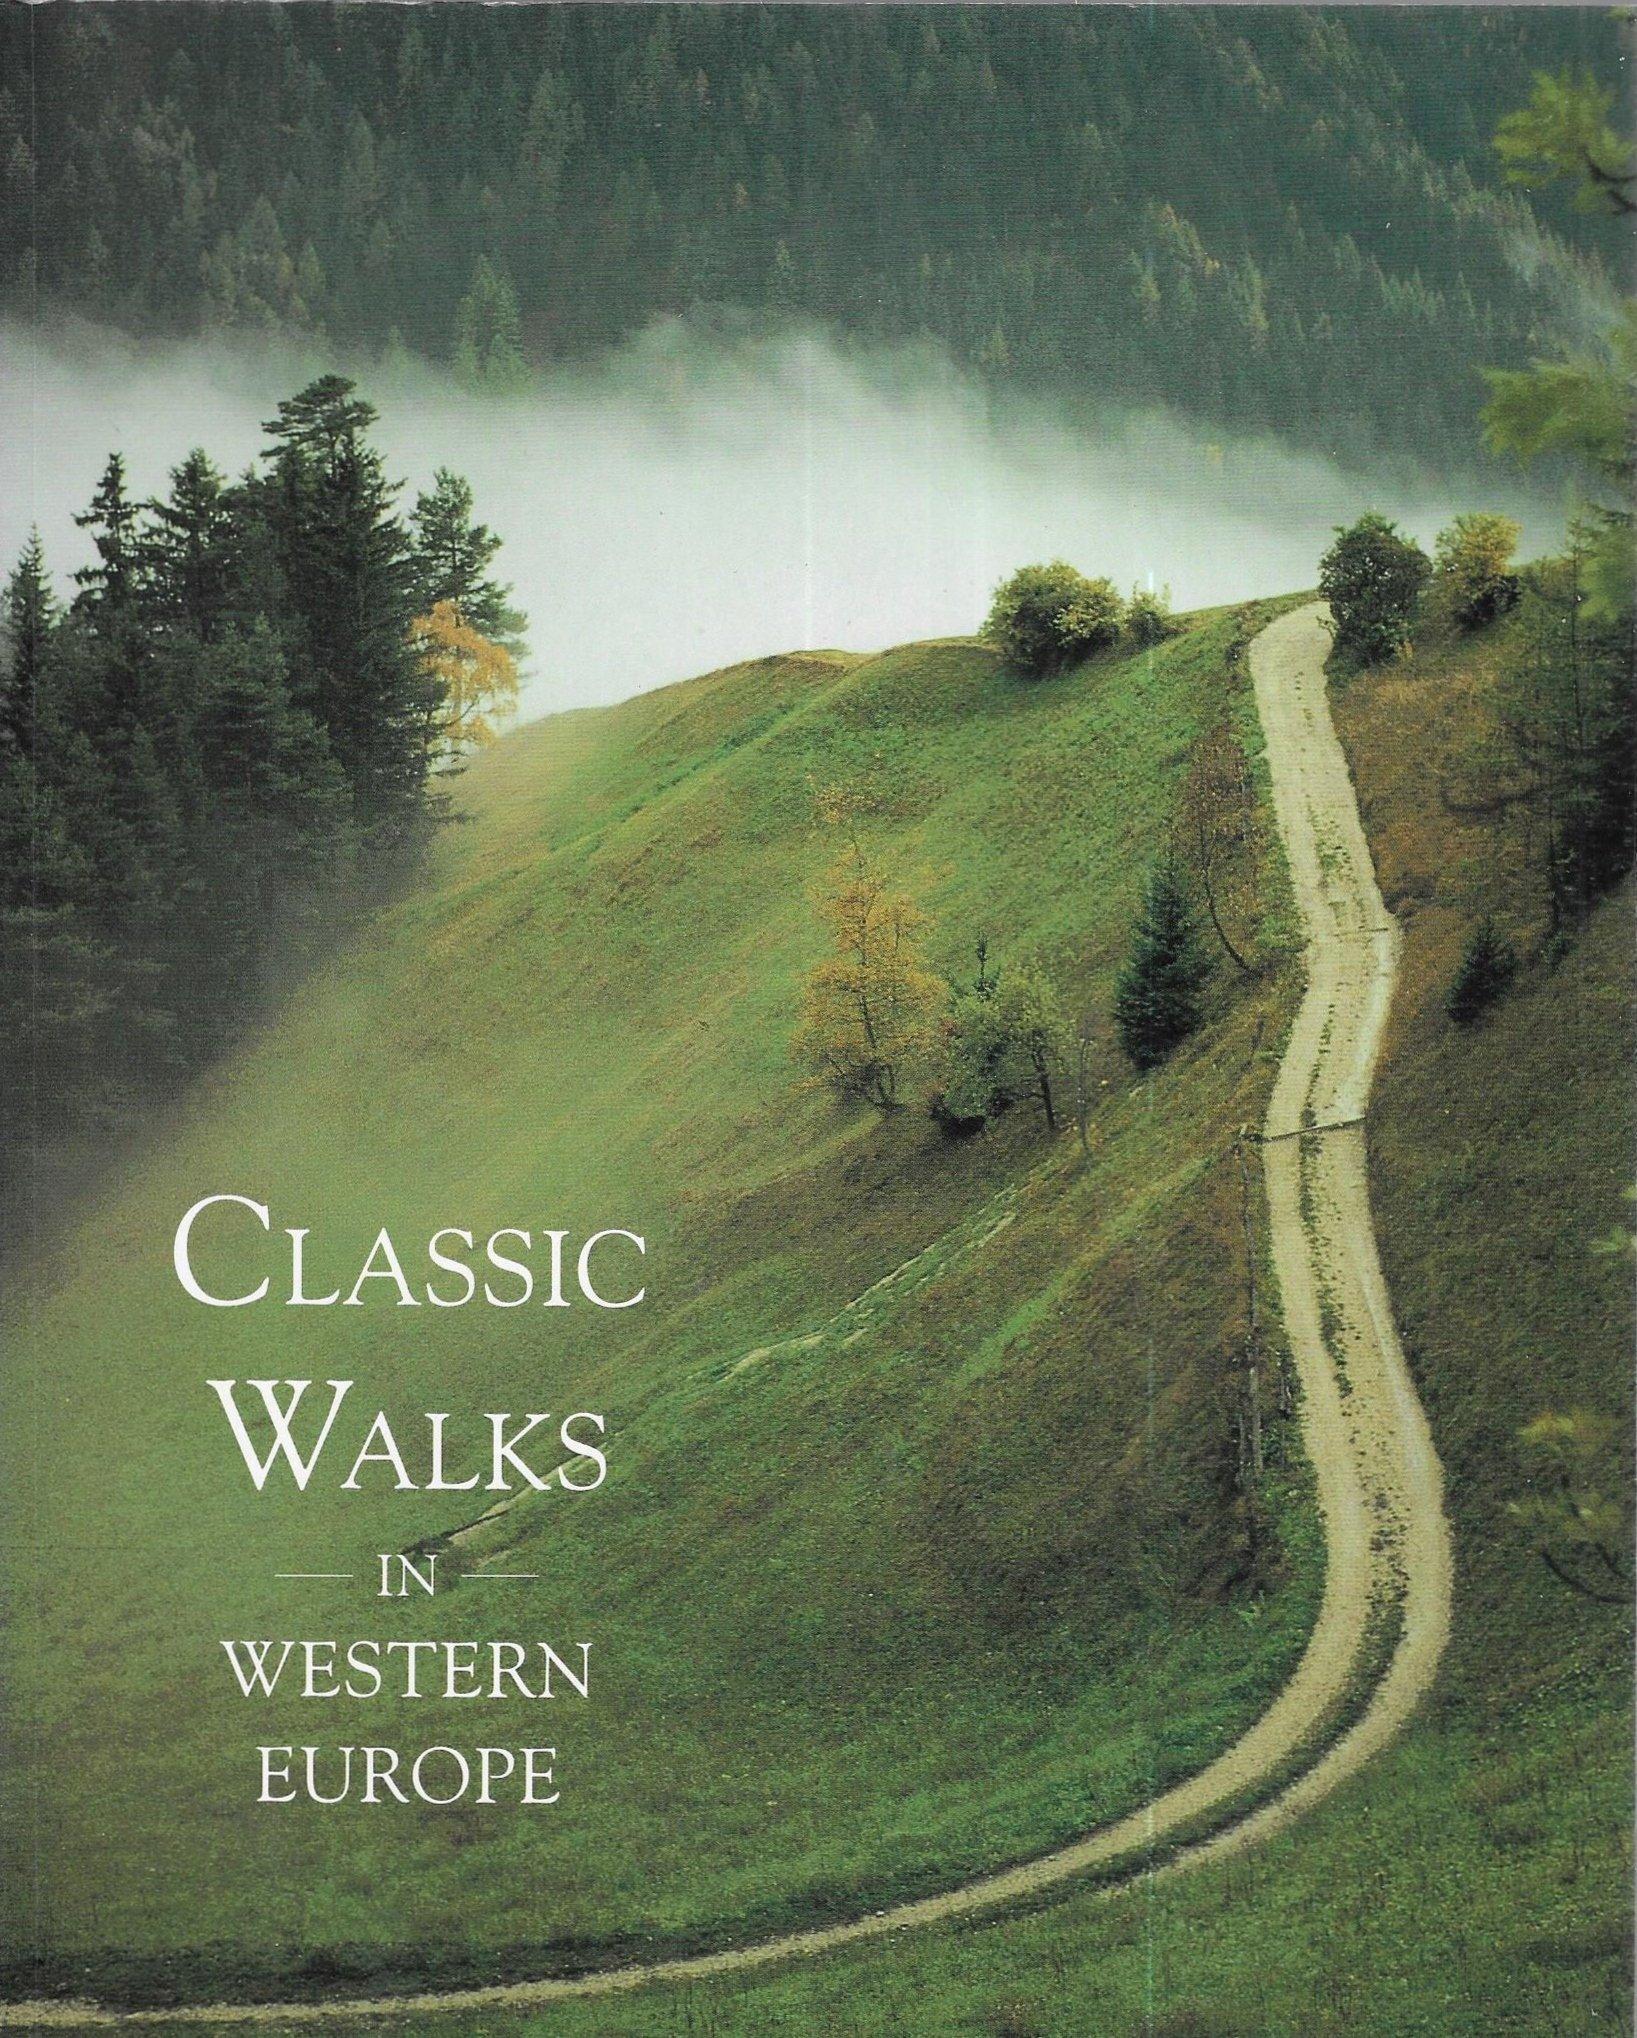 Classic Walks in Western Europe by Gillian Souter (2001-06-03) pdf epub